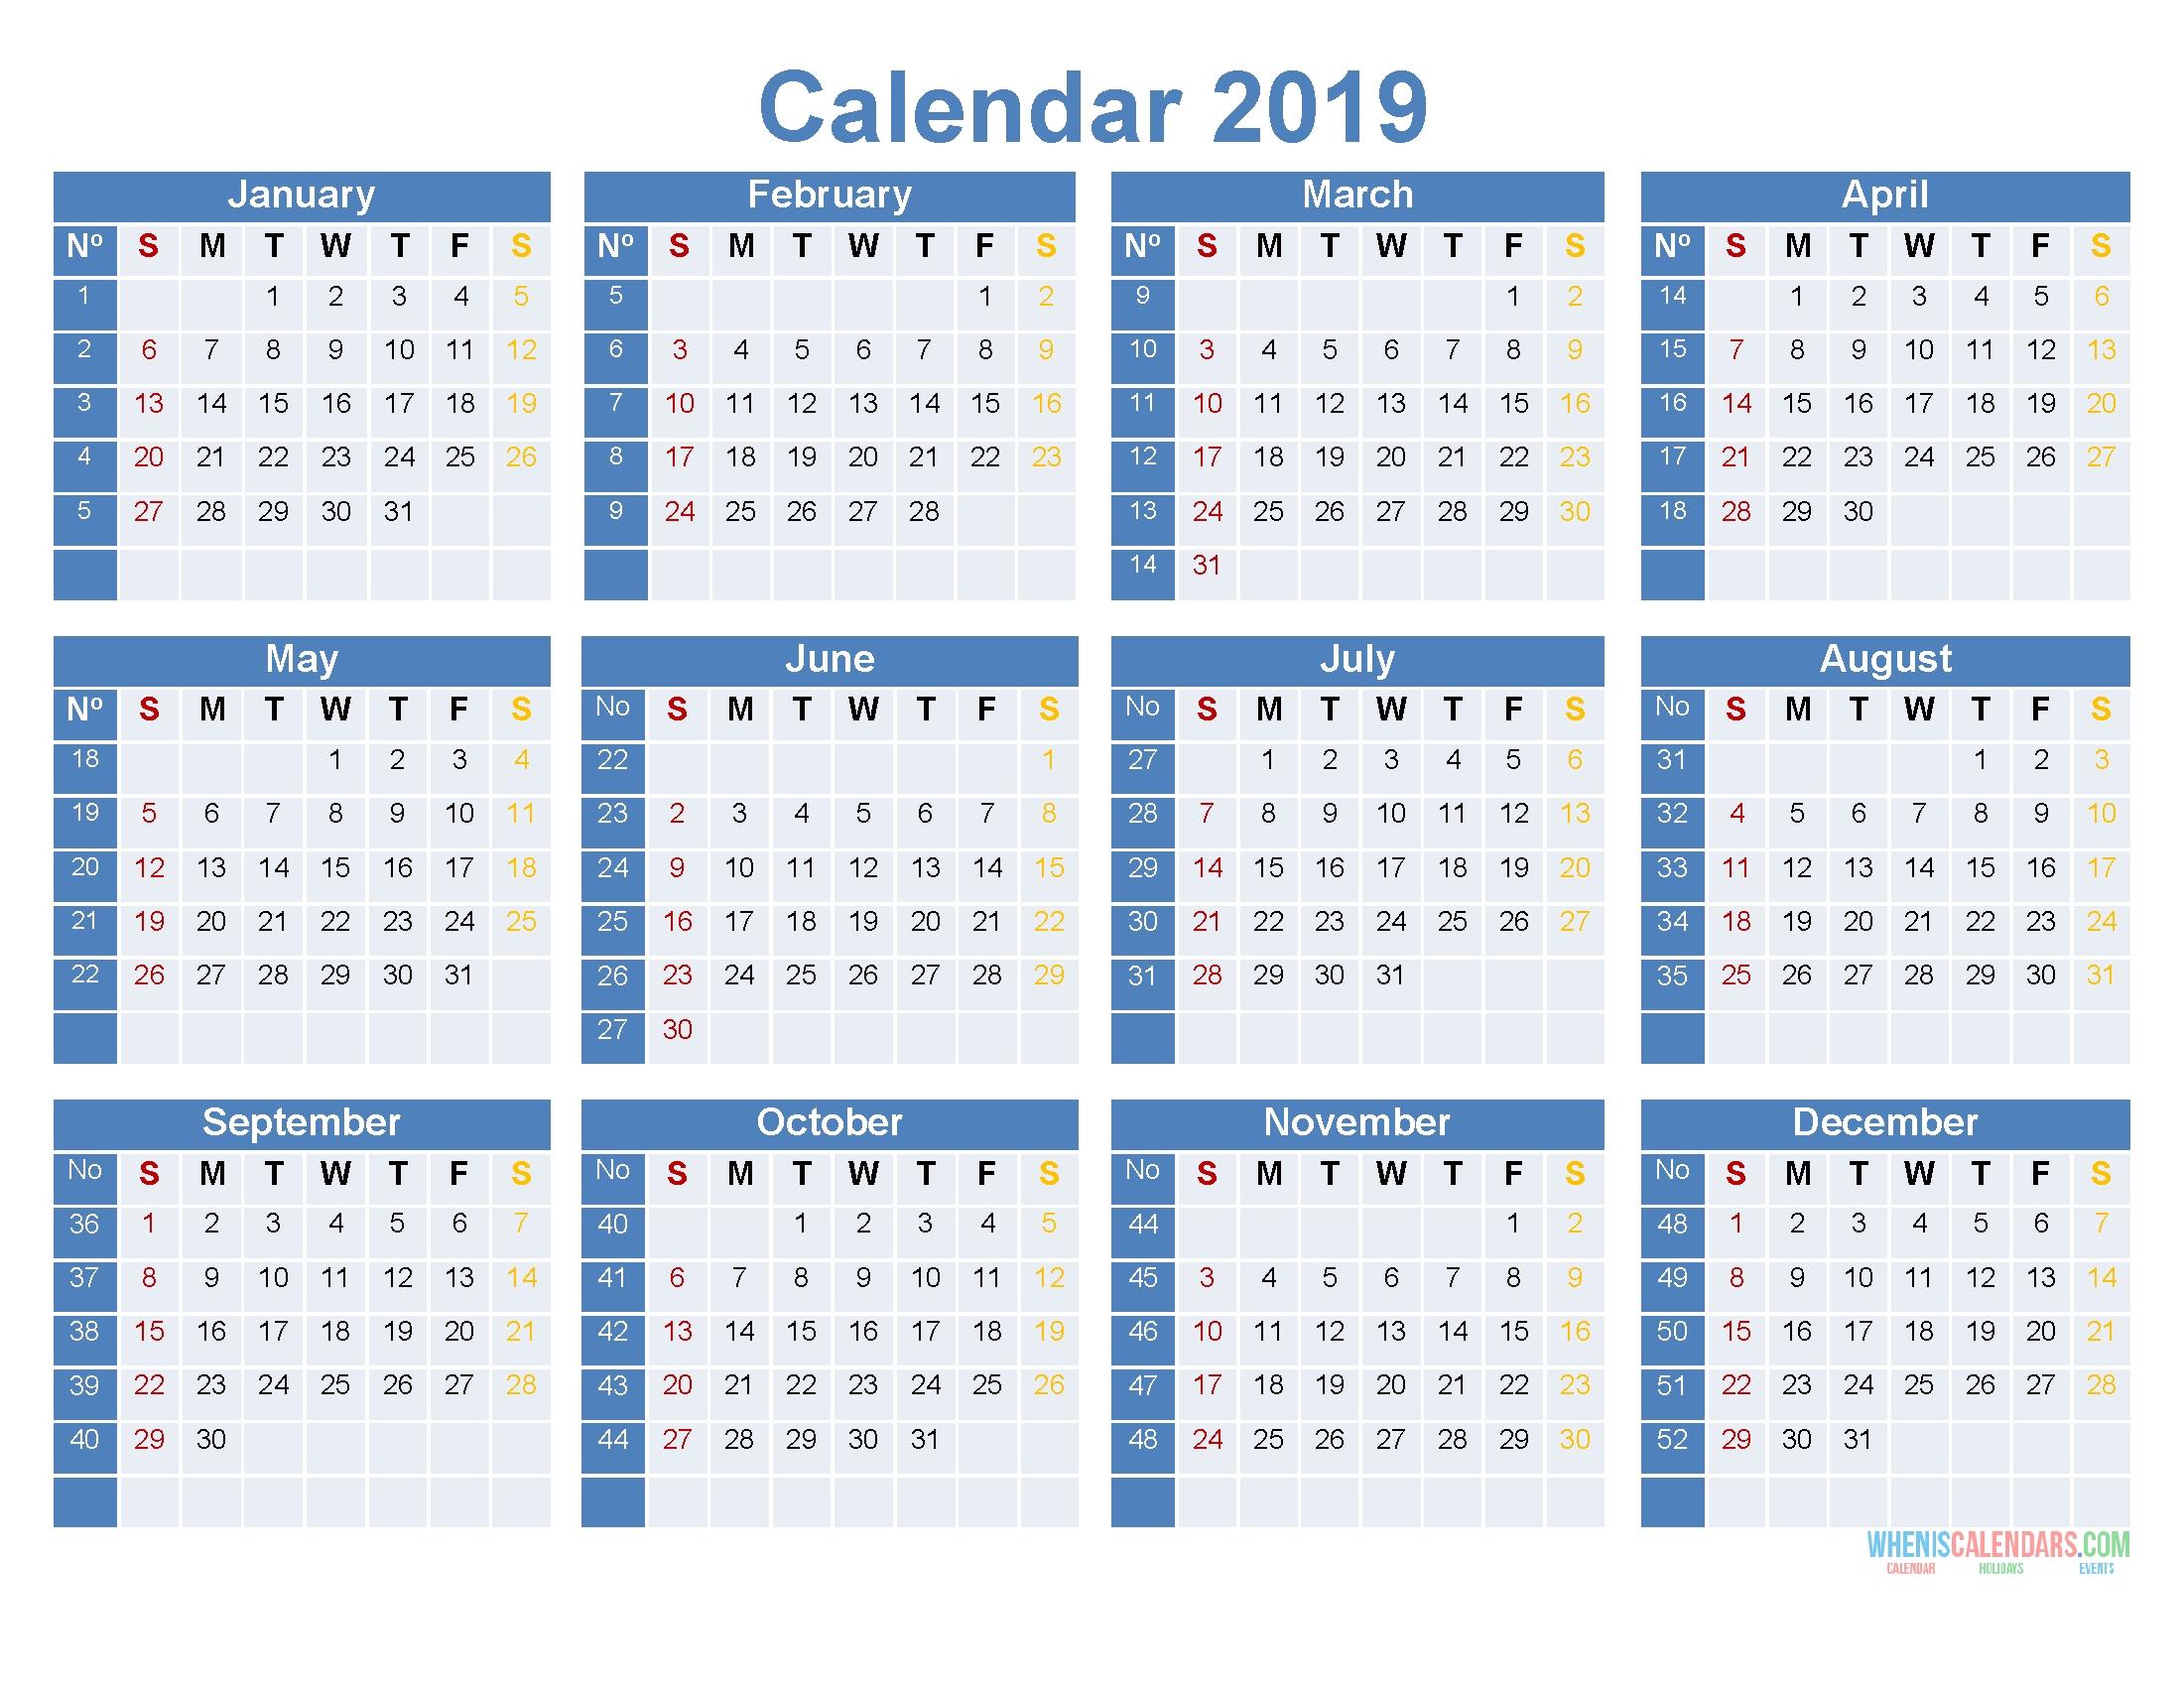 2019 12 Month Calendar Template Large Print Calendar Pdf Image 4c3r S2e1